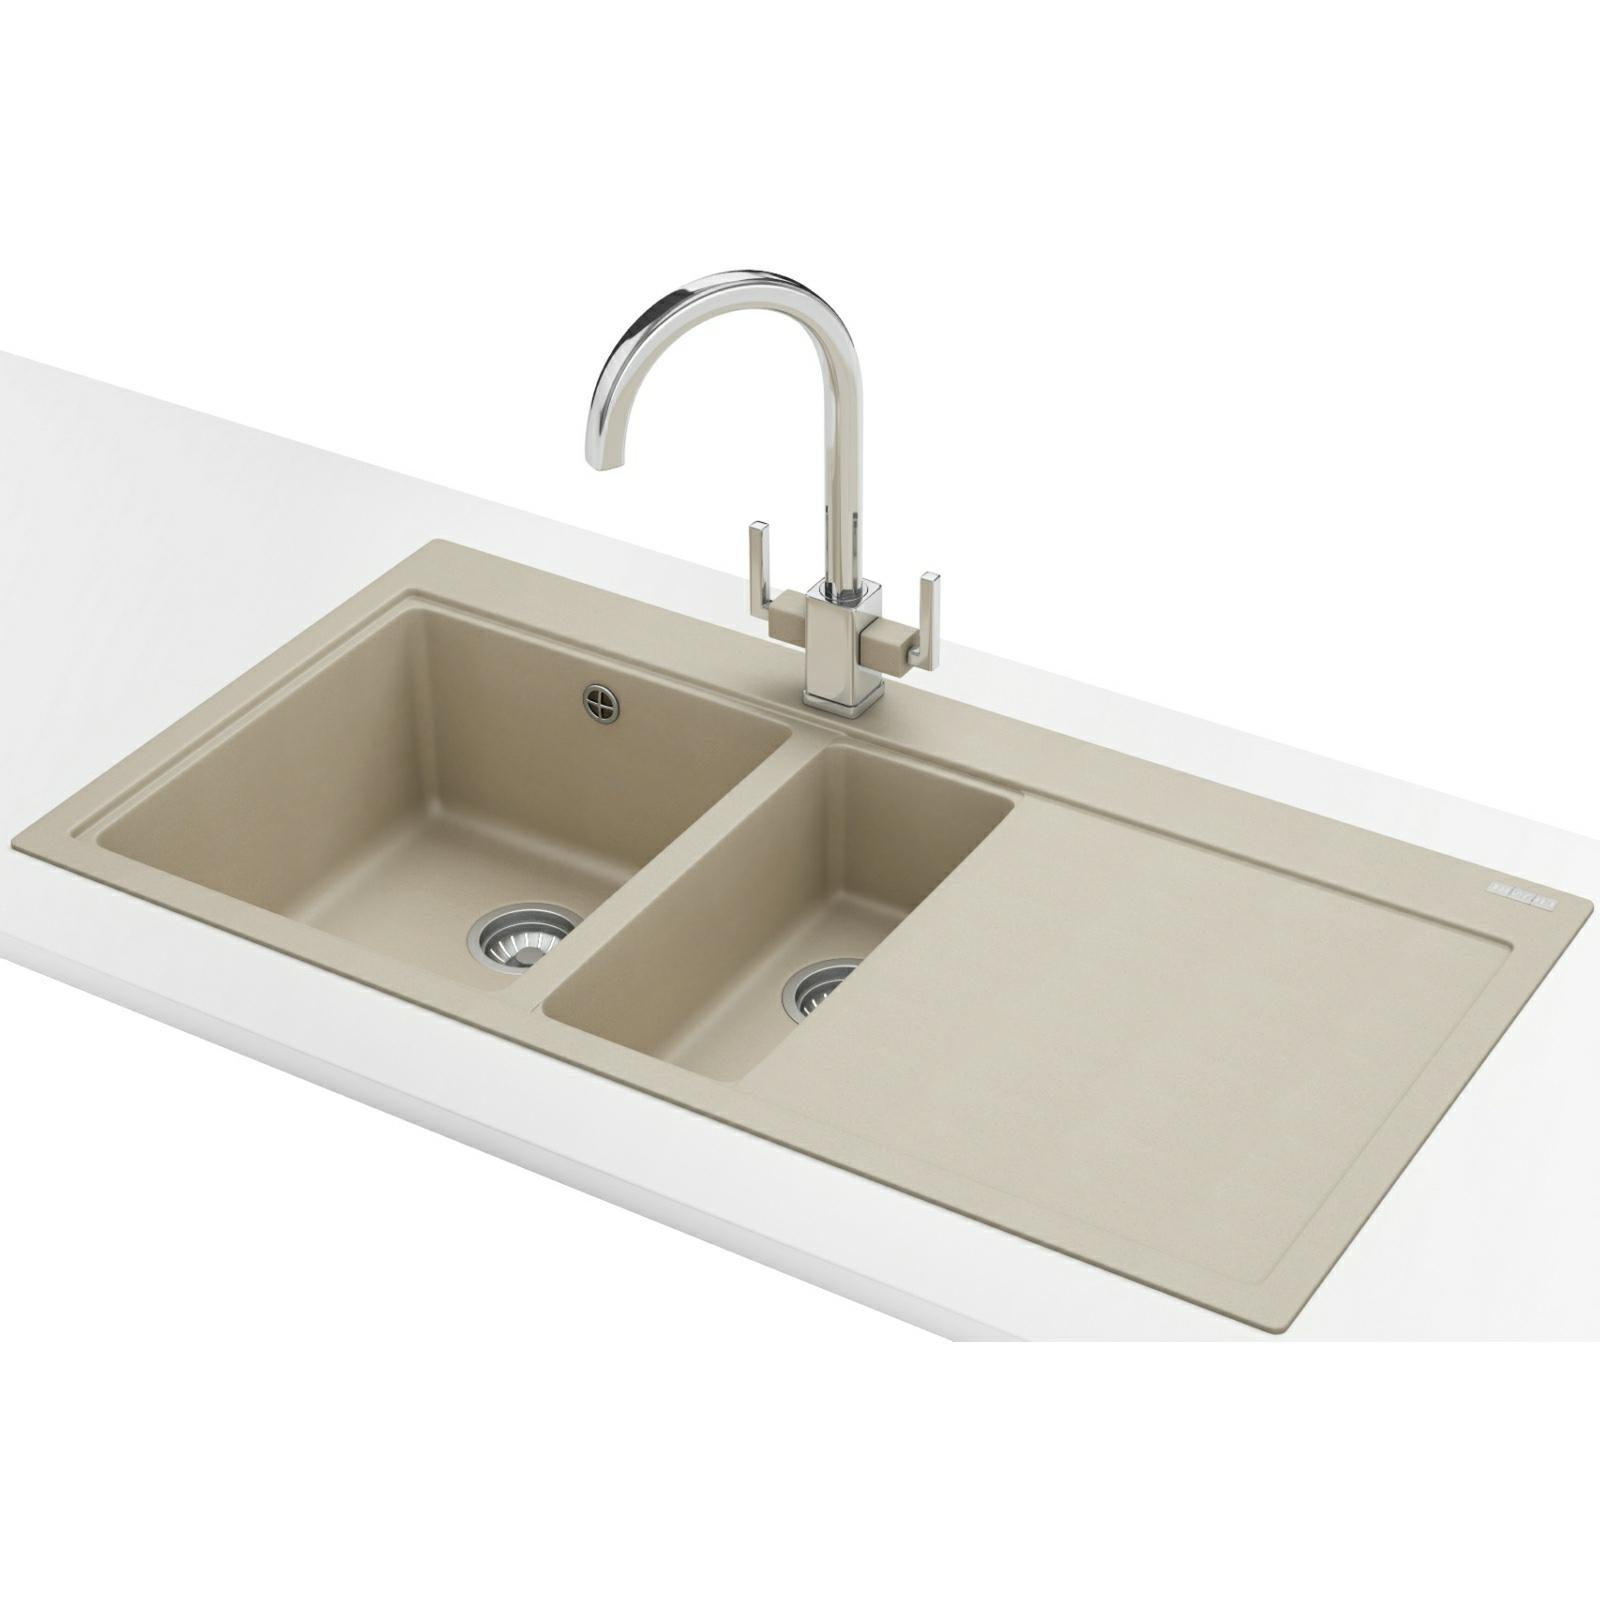 Franke Square Inset Sink : Franke Mythos MTG 651-100 Fragranite Coffee 1.5 Bowl RHD Inset Sink